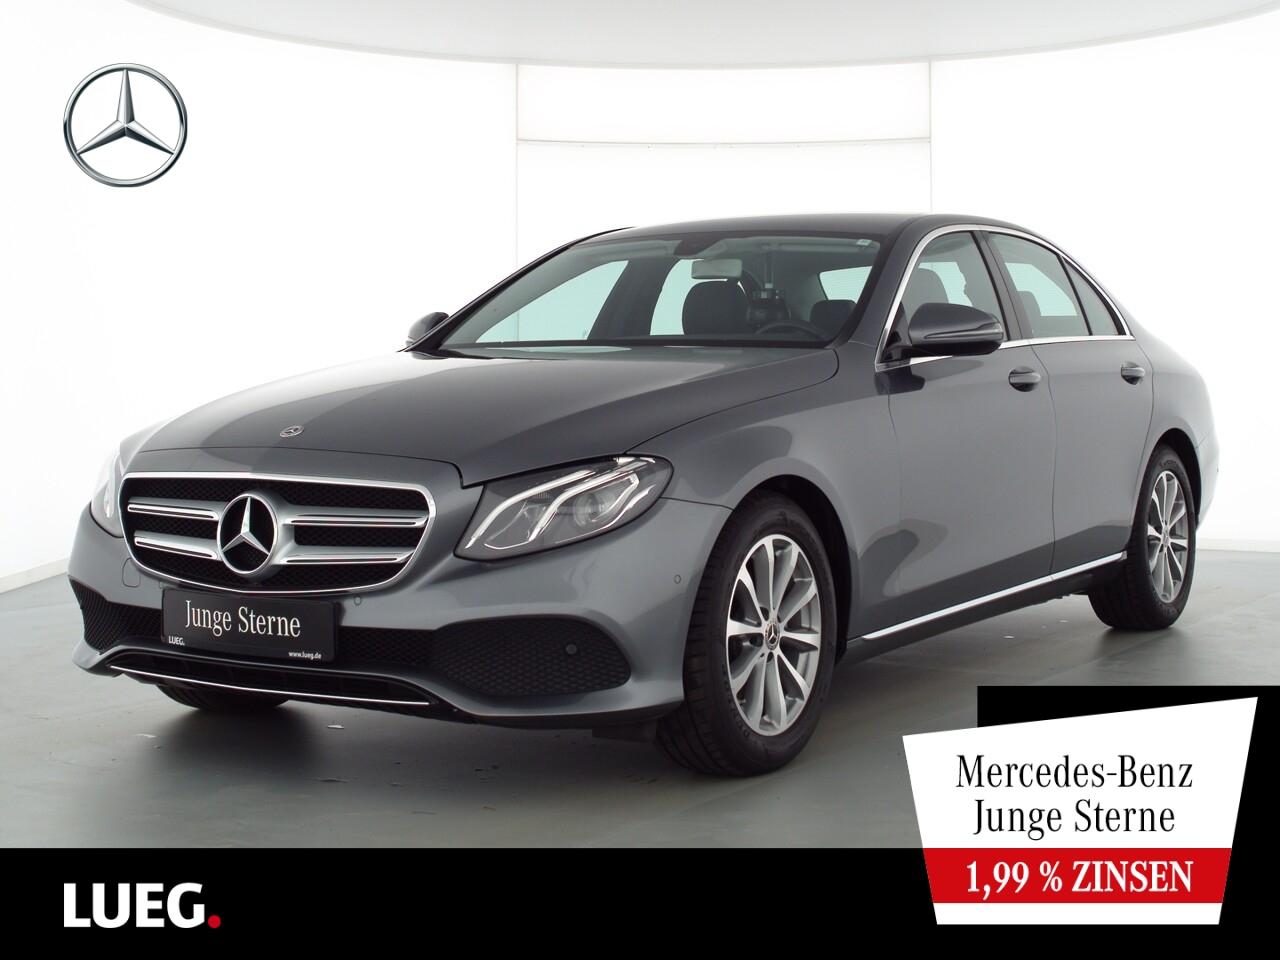 Mercedes-Benz E 200 d Avantgarde+Navi+LED-HP+AHK+ParkAs+Kamera, Jahr 2018, Diesel